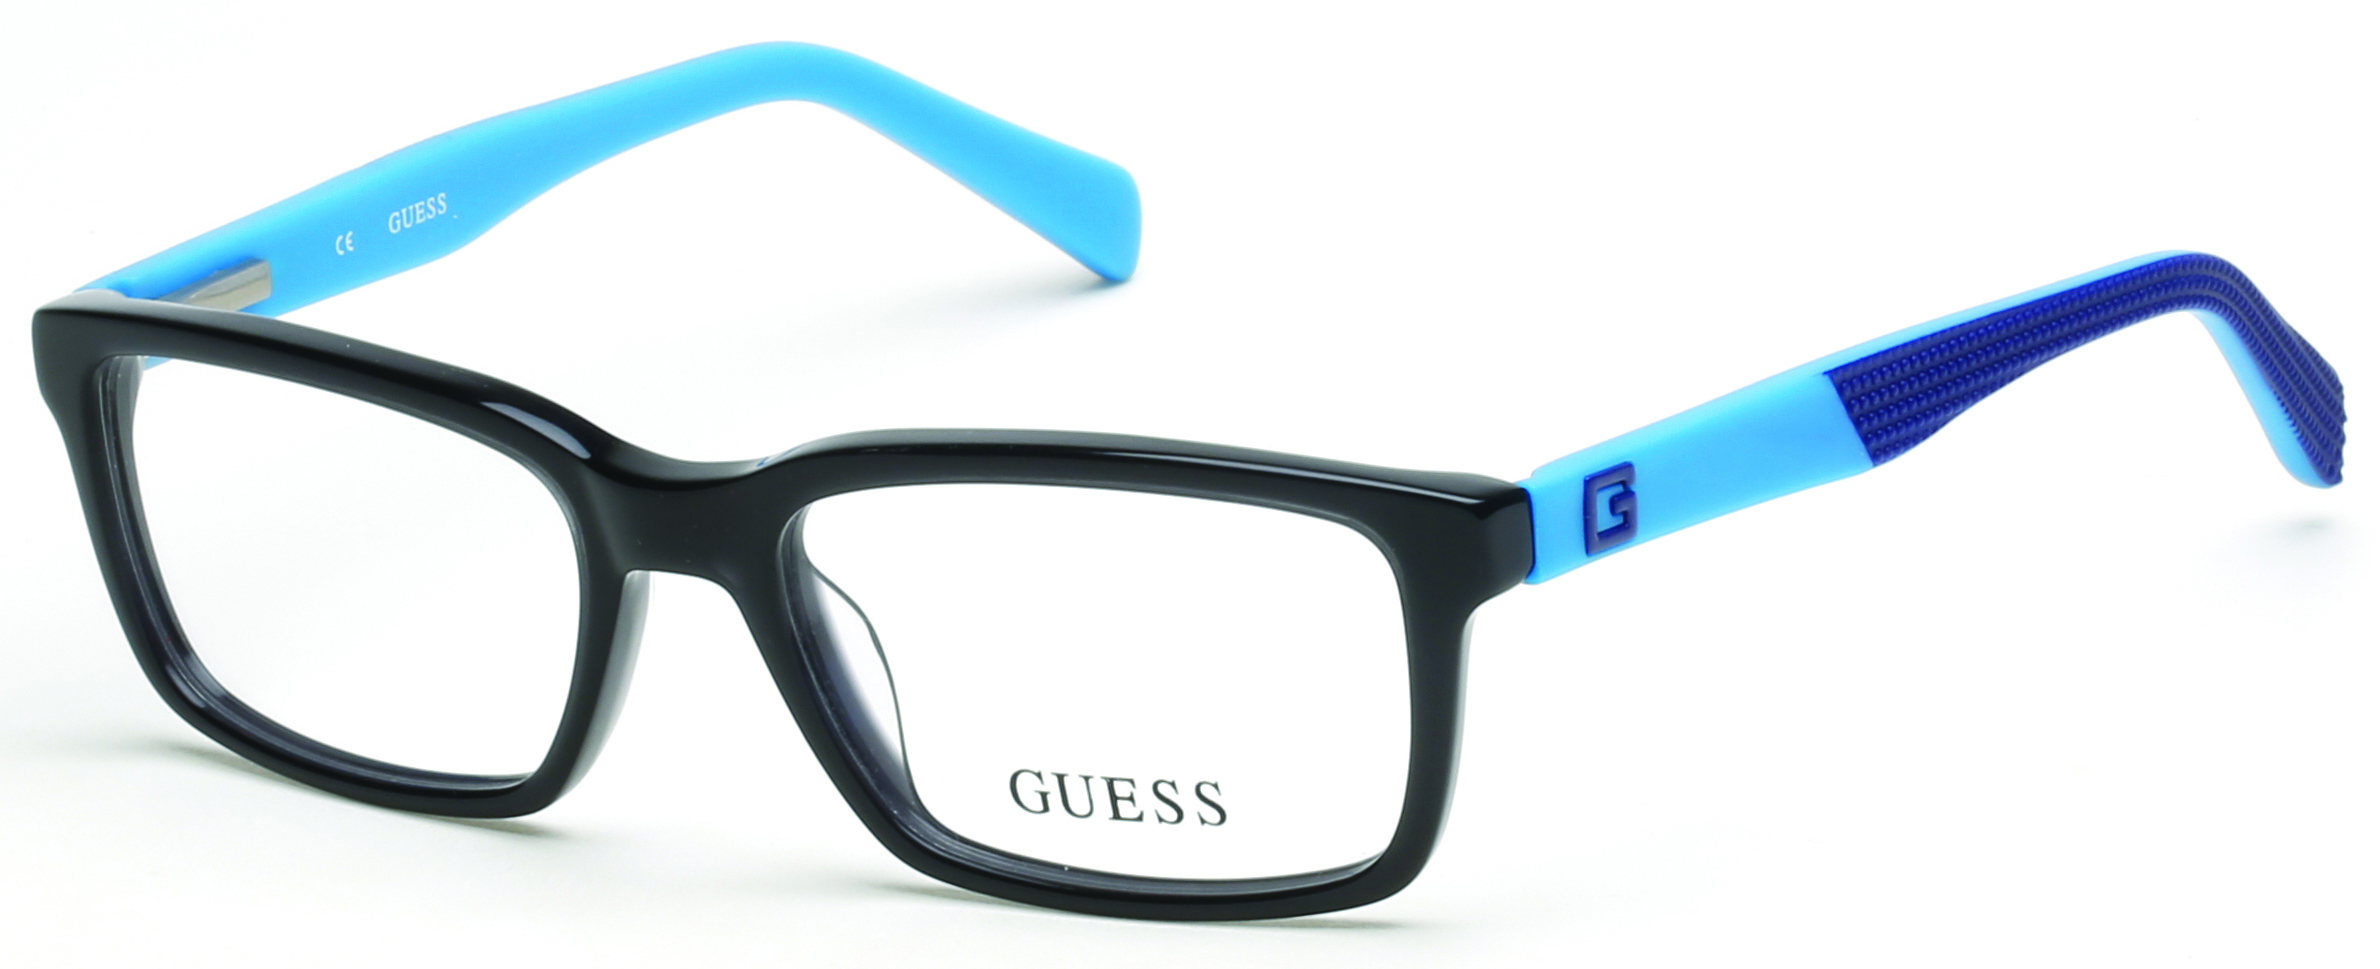 336627b2e55 Eyewear for Kids - Guess - Optiwow